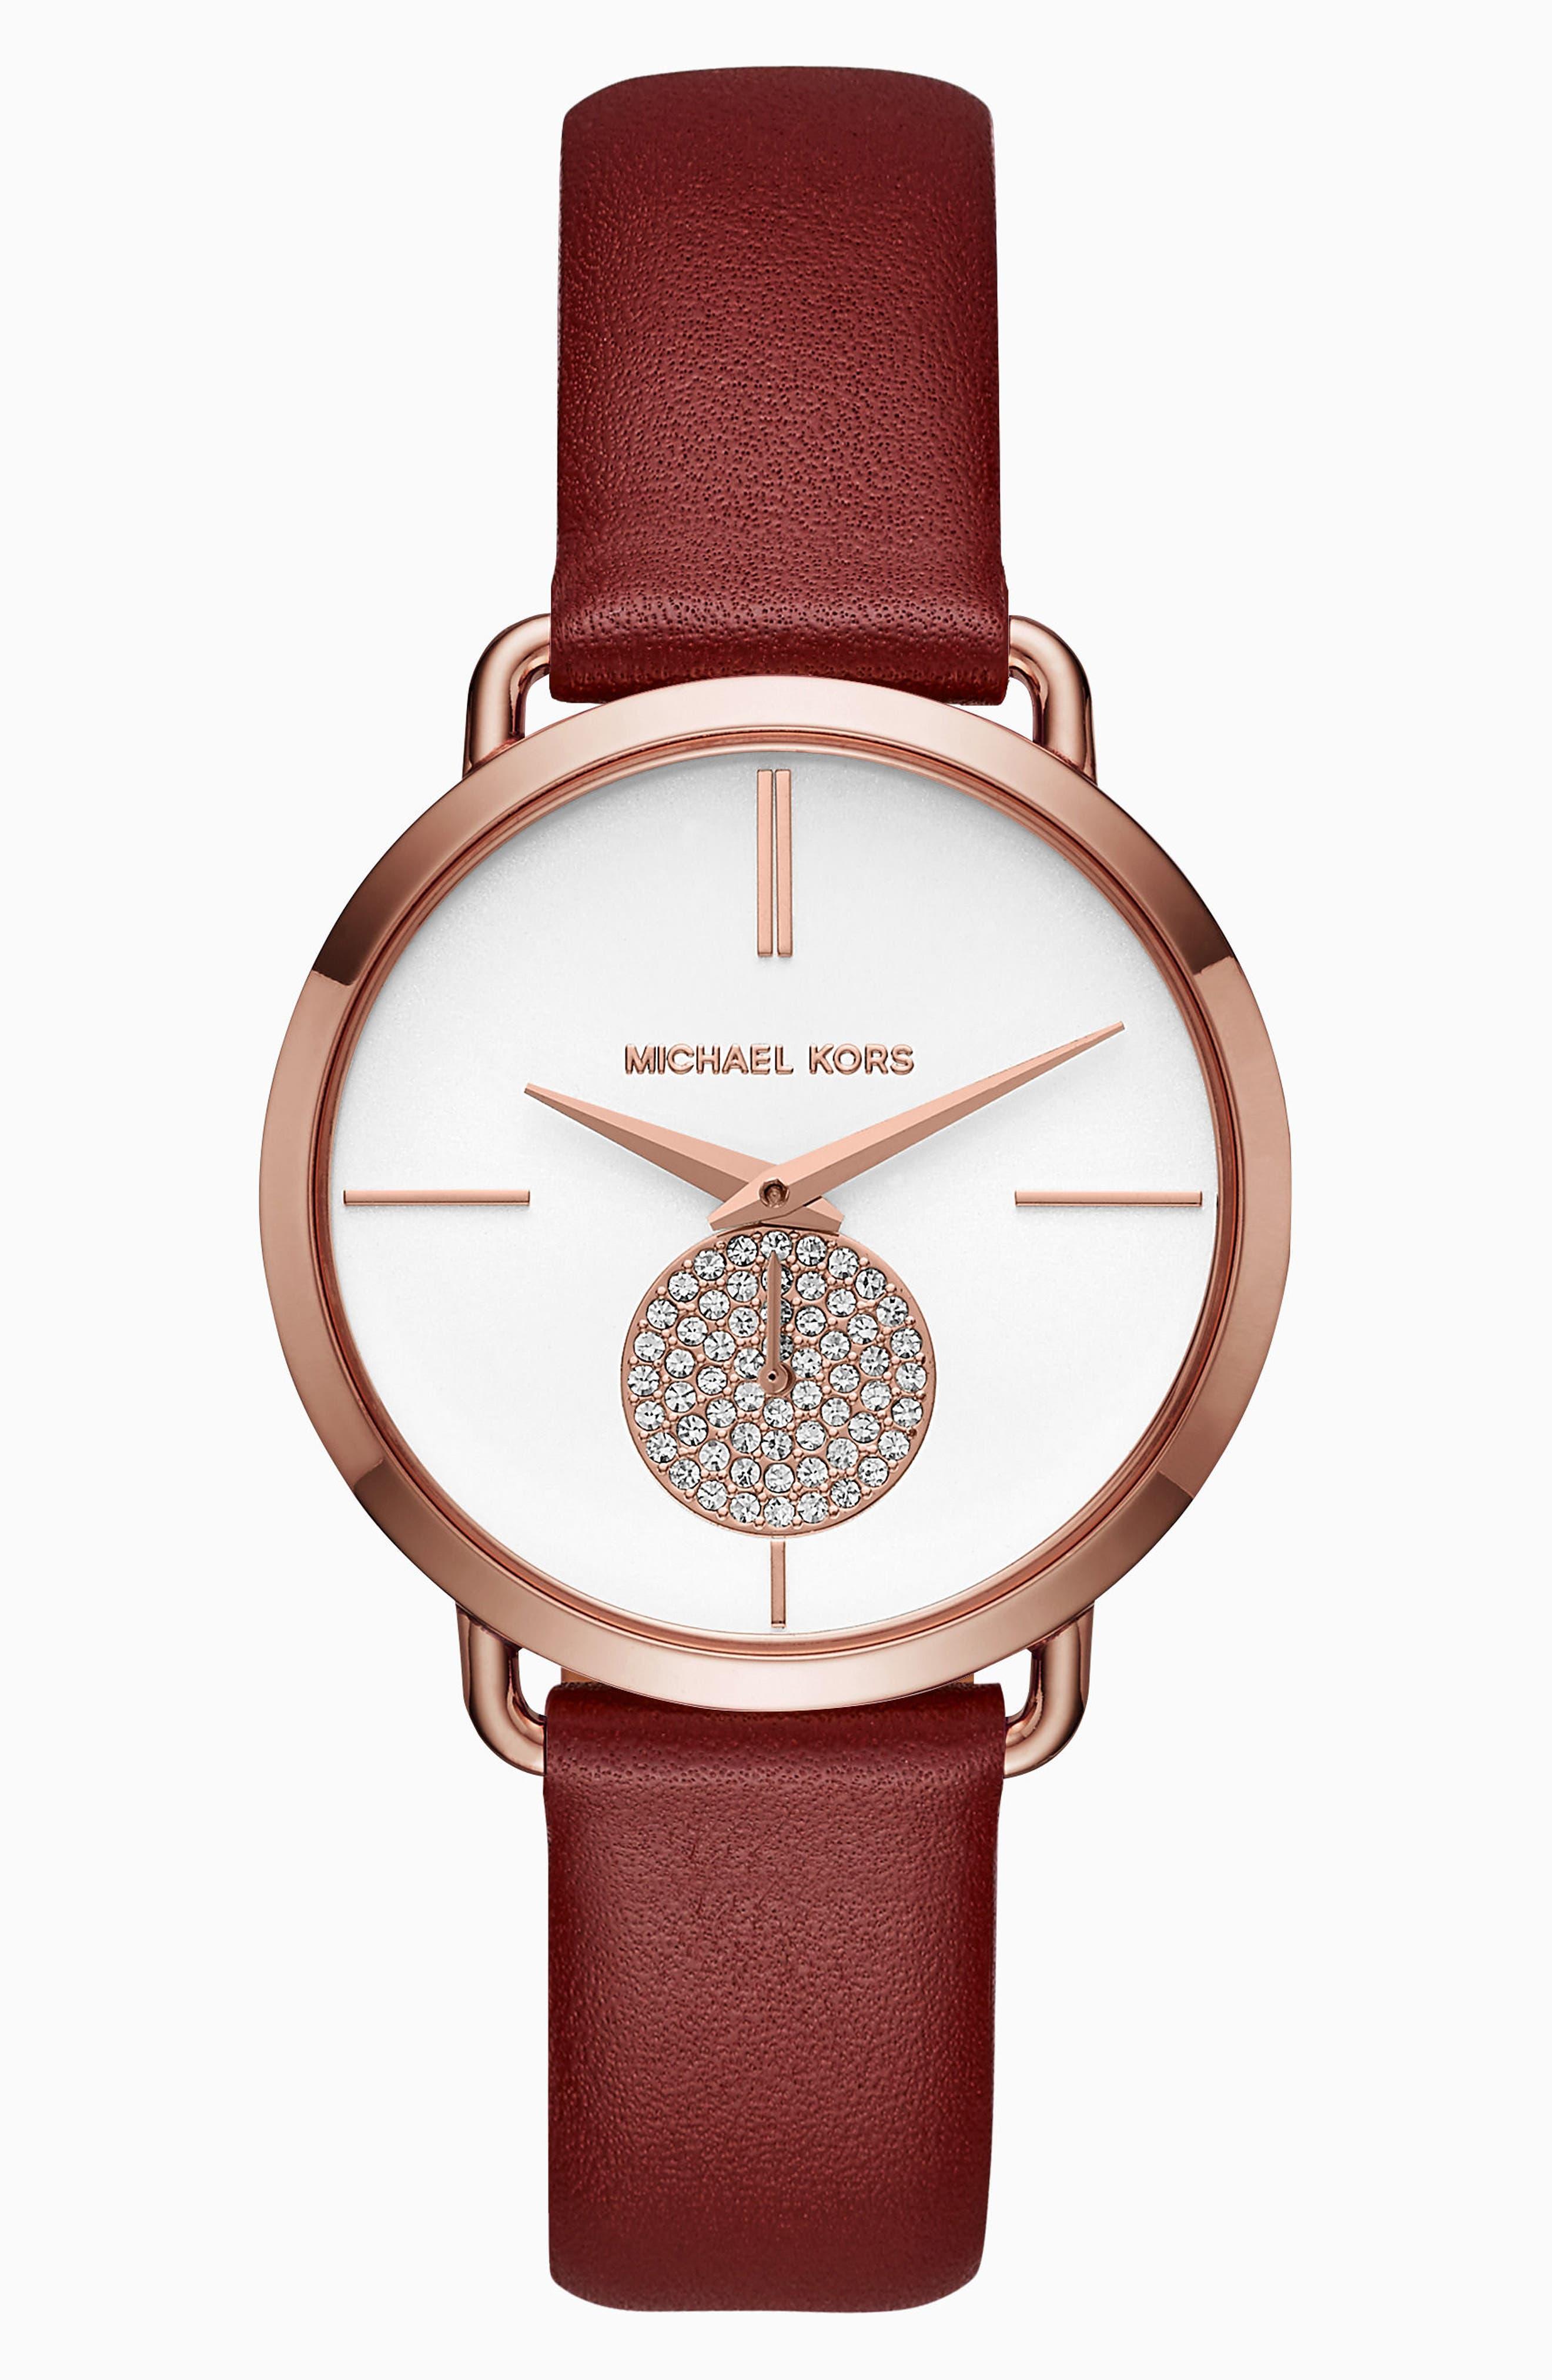 Main Image - Michael Kors Portia Leather Strap Watch, 36mm